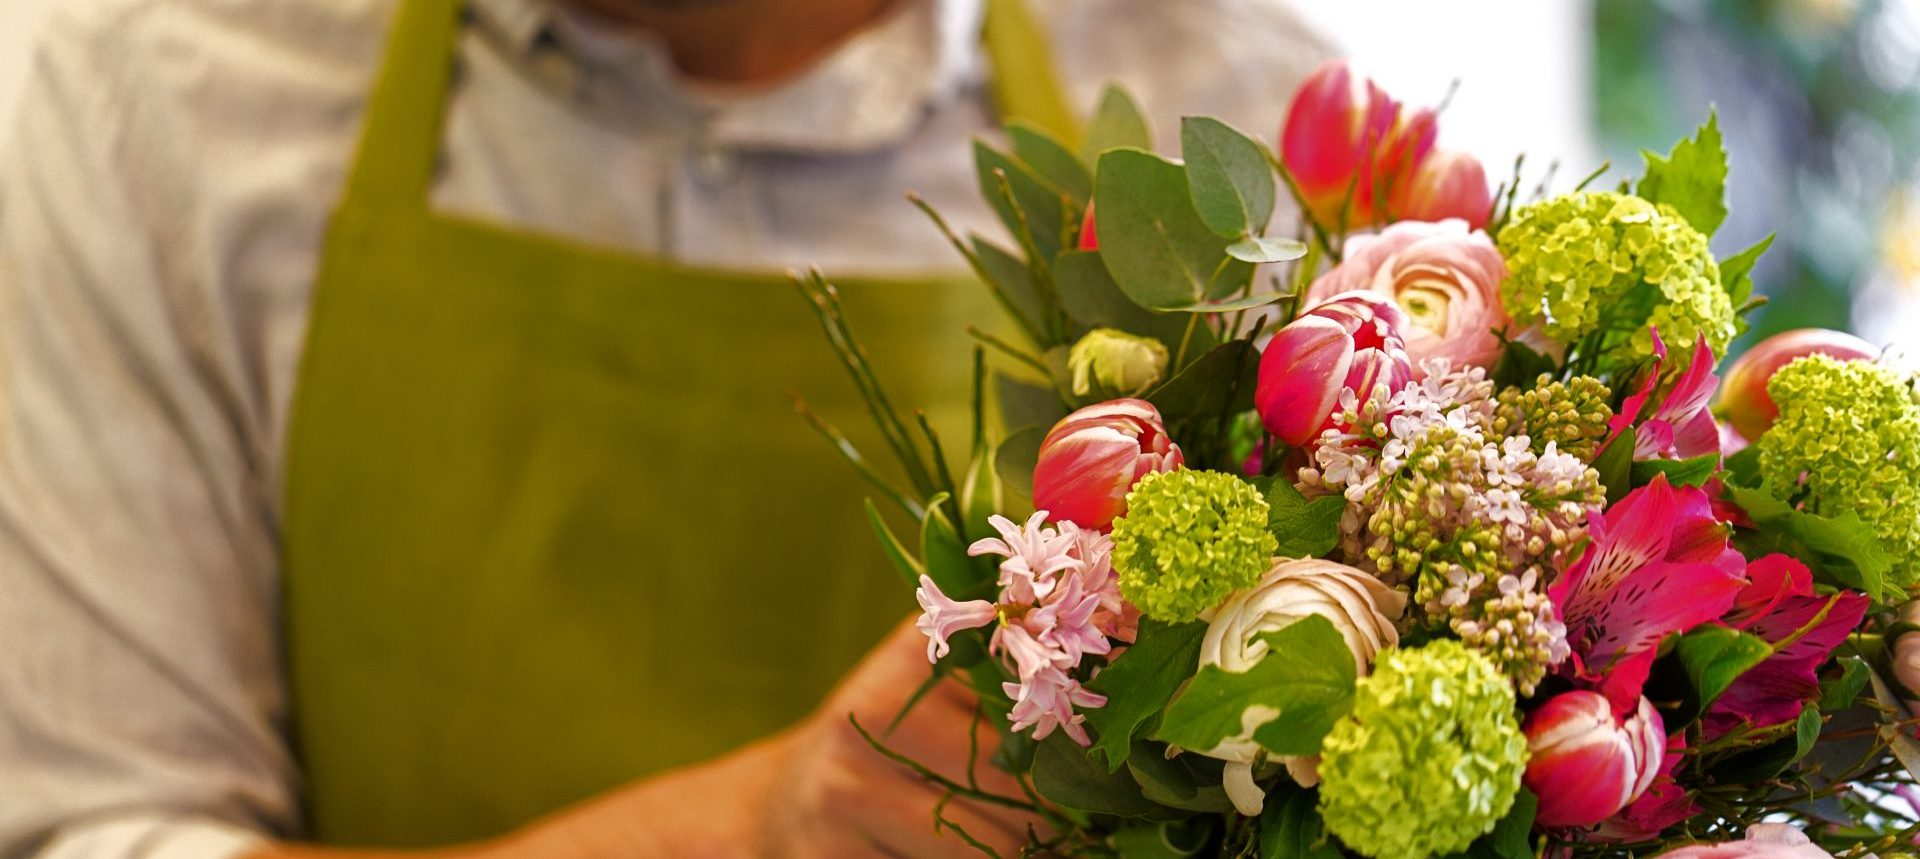 Man bos bloemen tulpen ranonkel alstromeria eucalyptus blad hydrangea